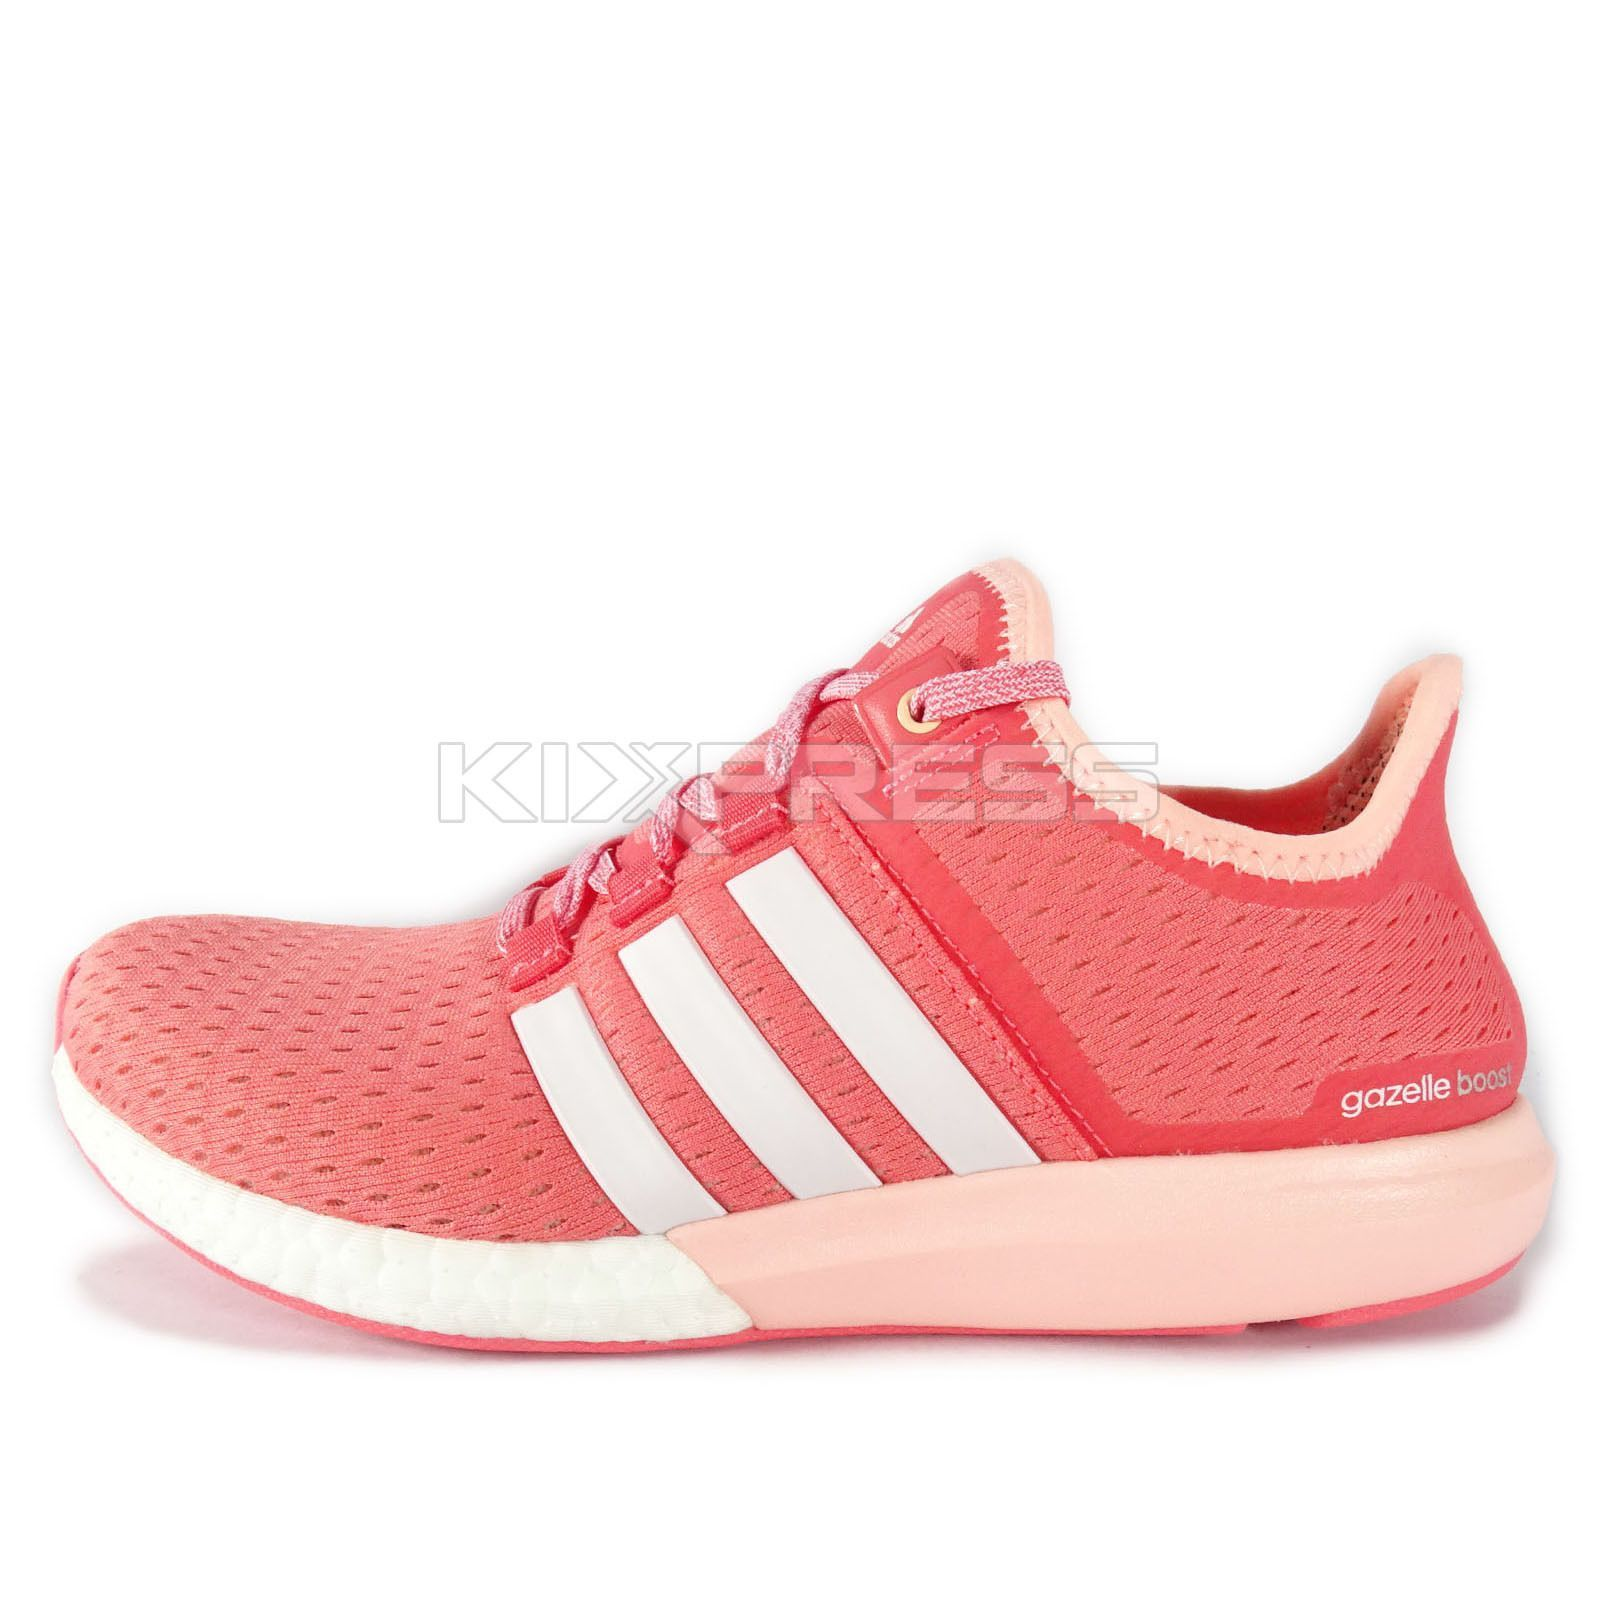 Adidas Cc Gazelle Boost W  S77245  Running Coral Pink  8e5717af13